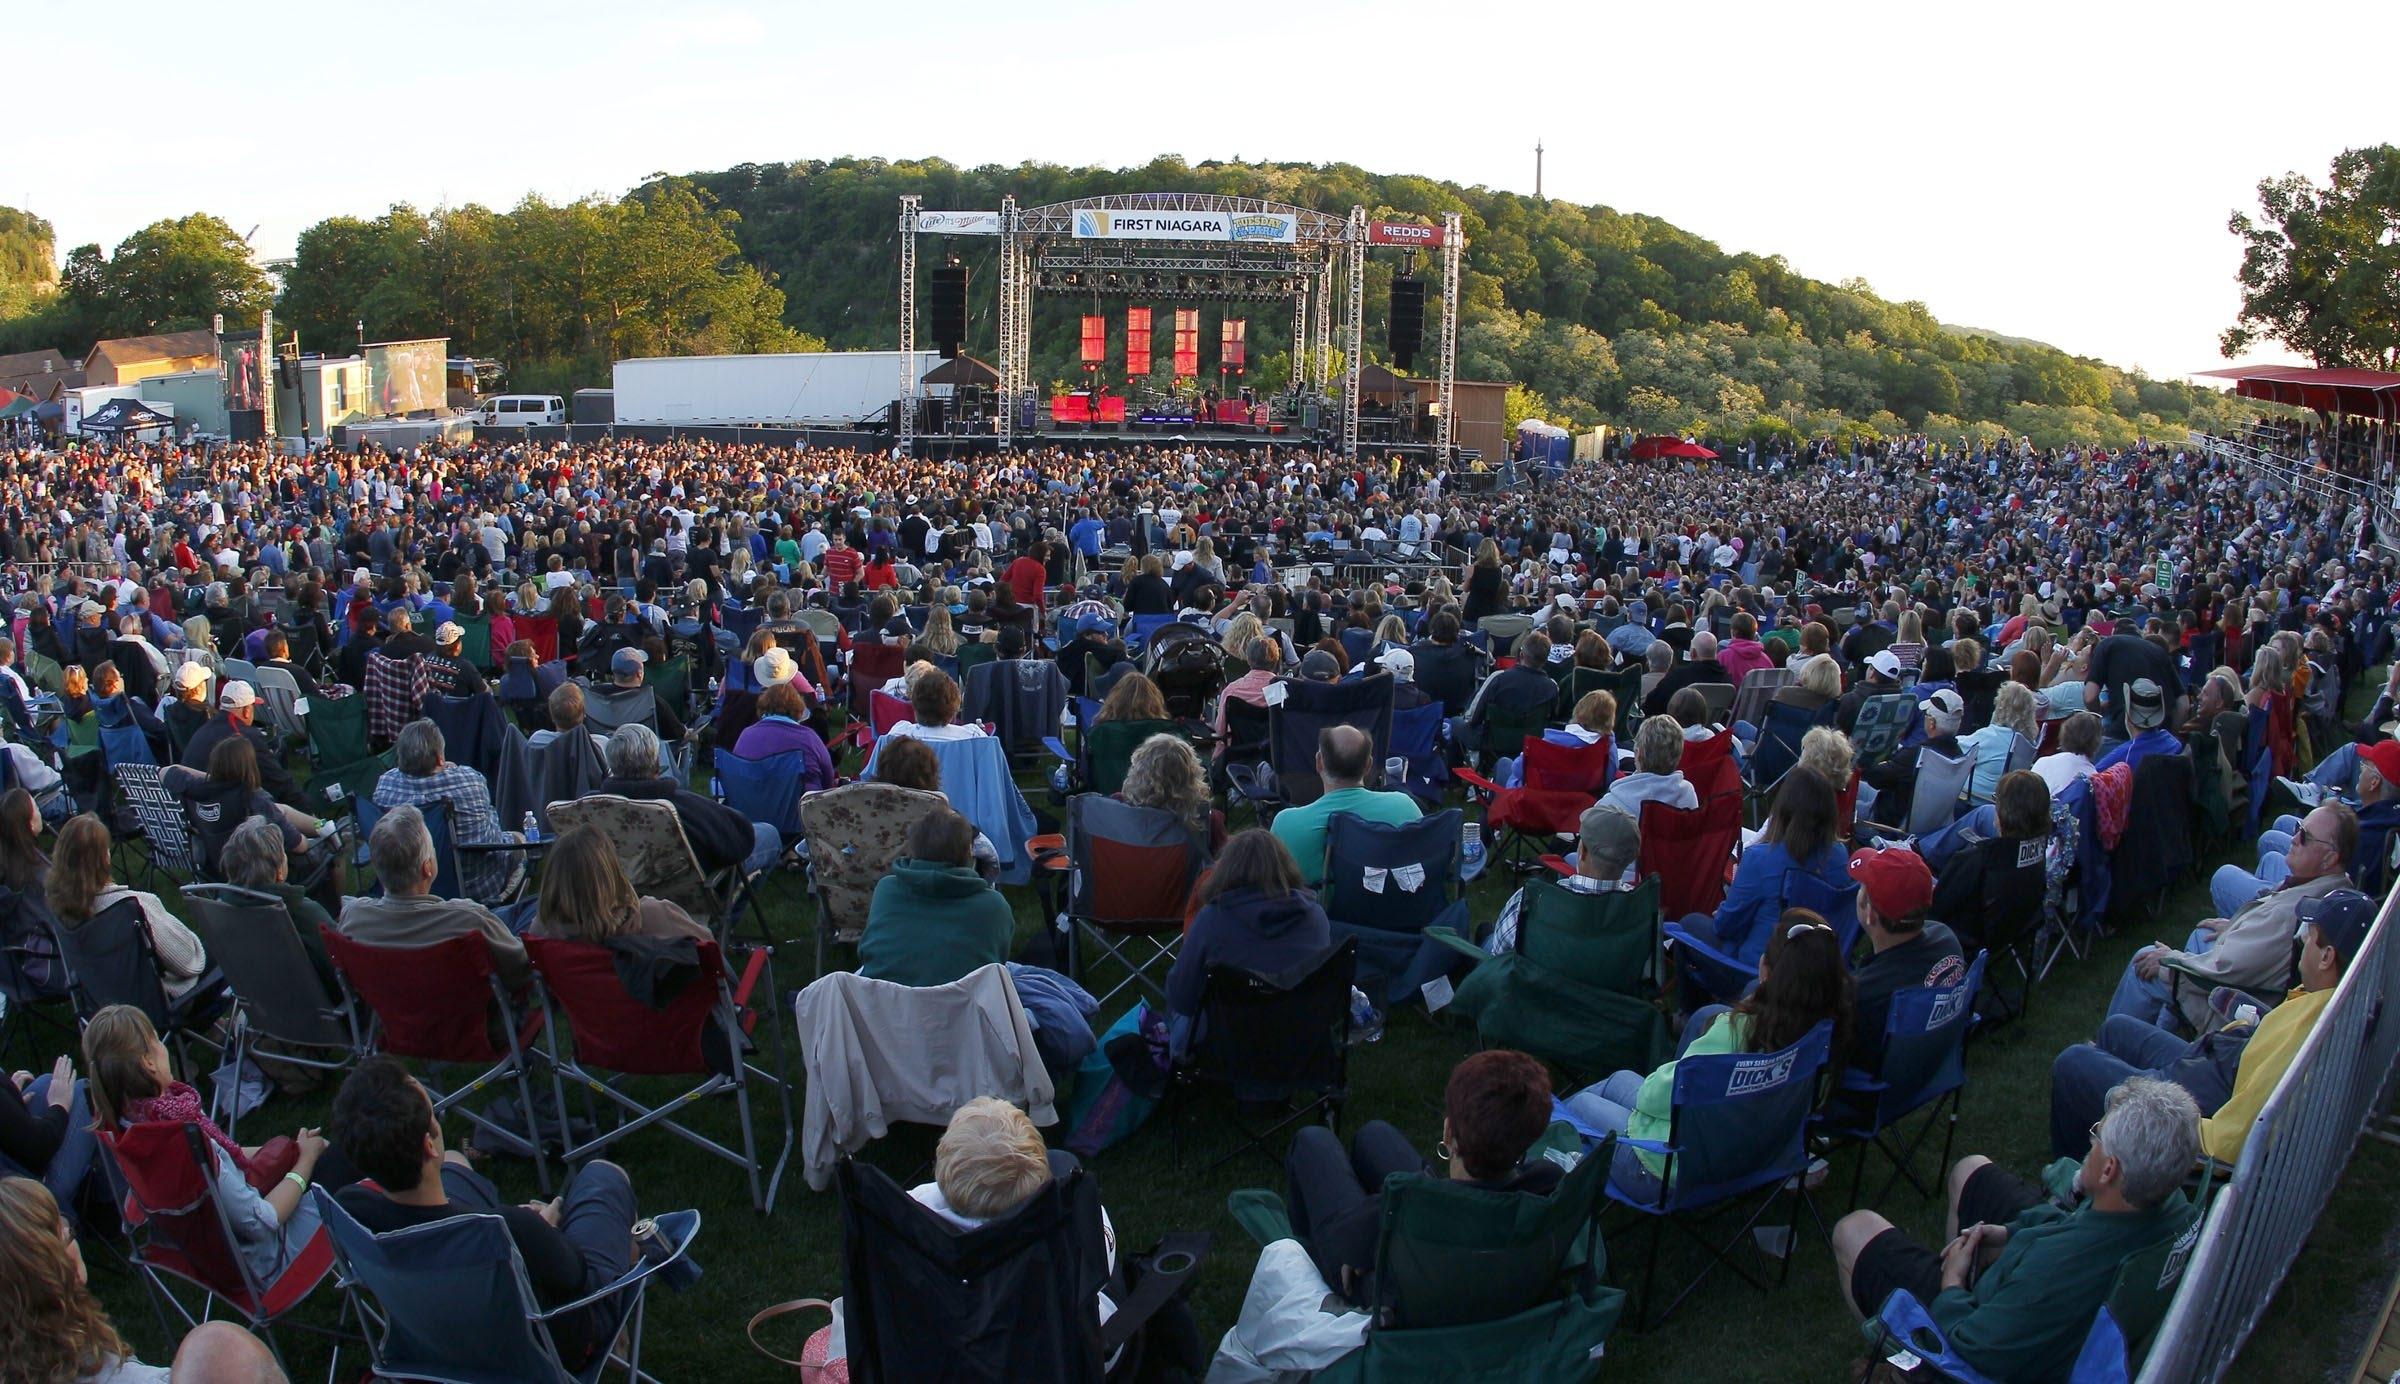 Fans watch a performance at Artpark.